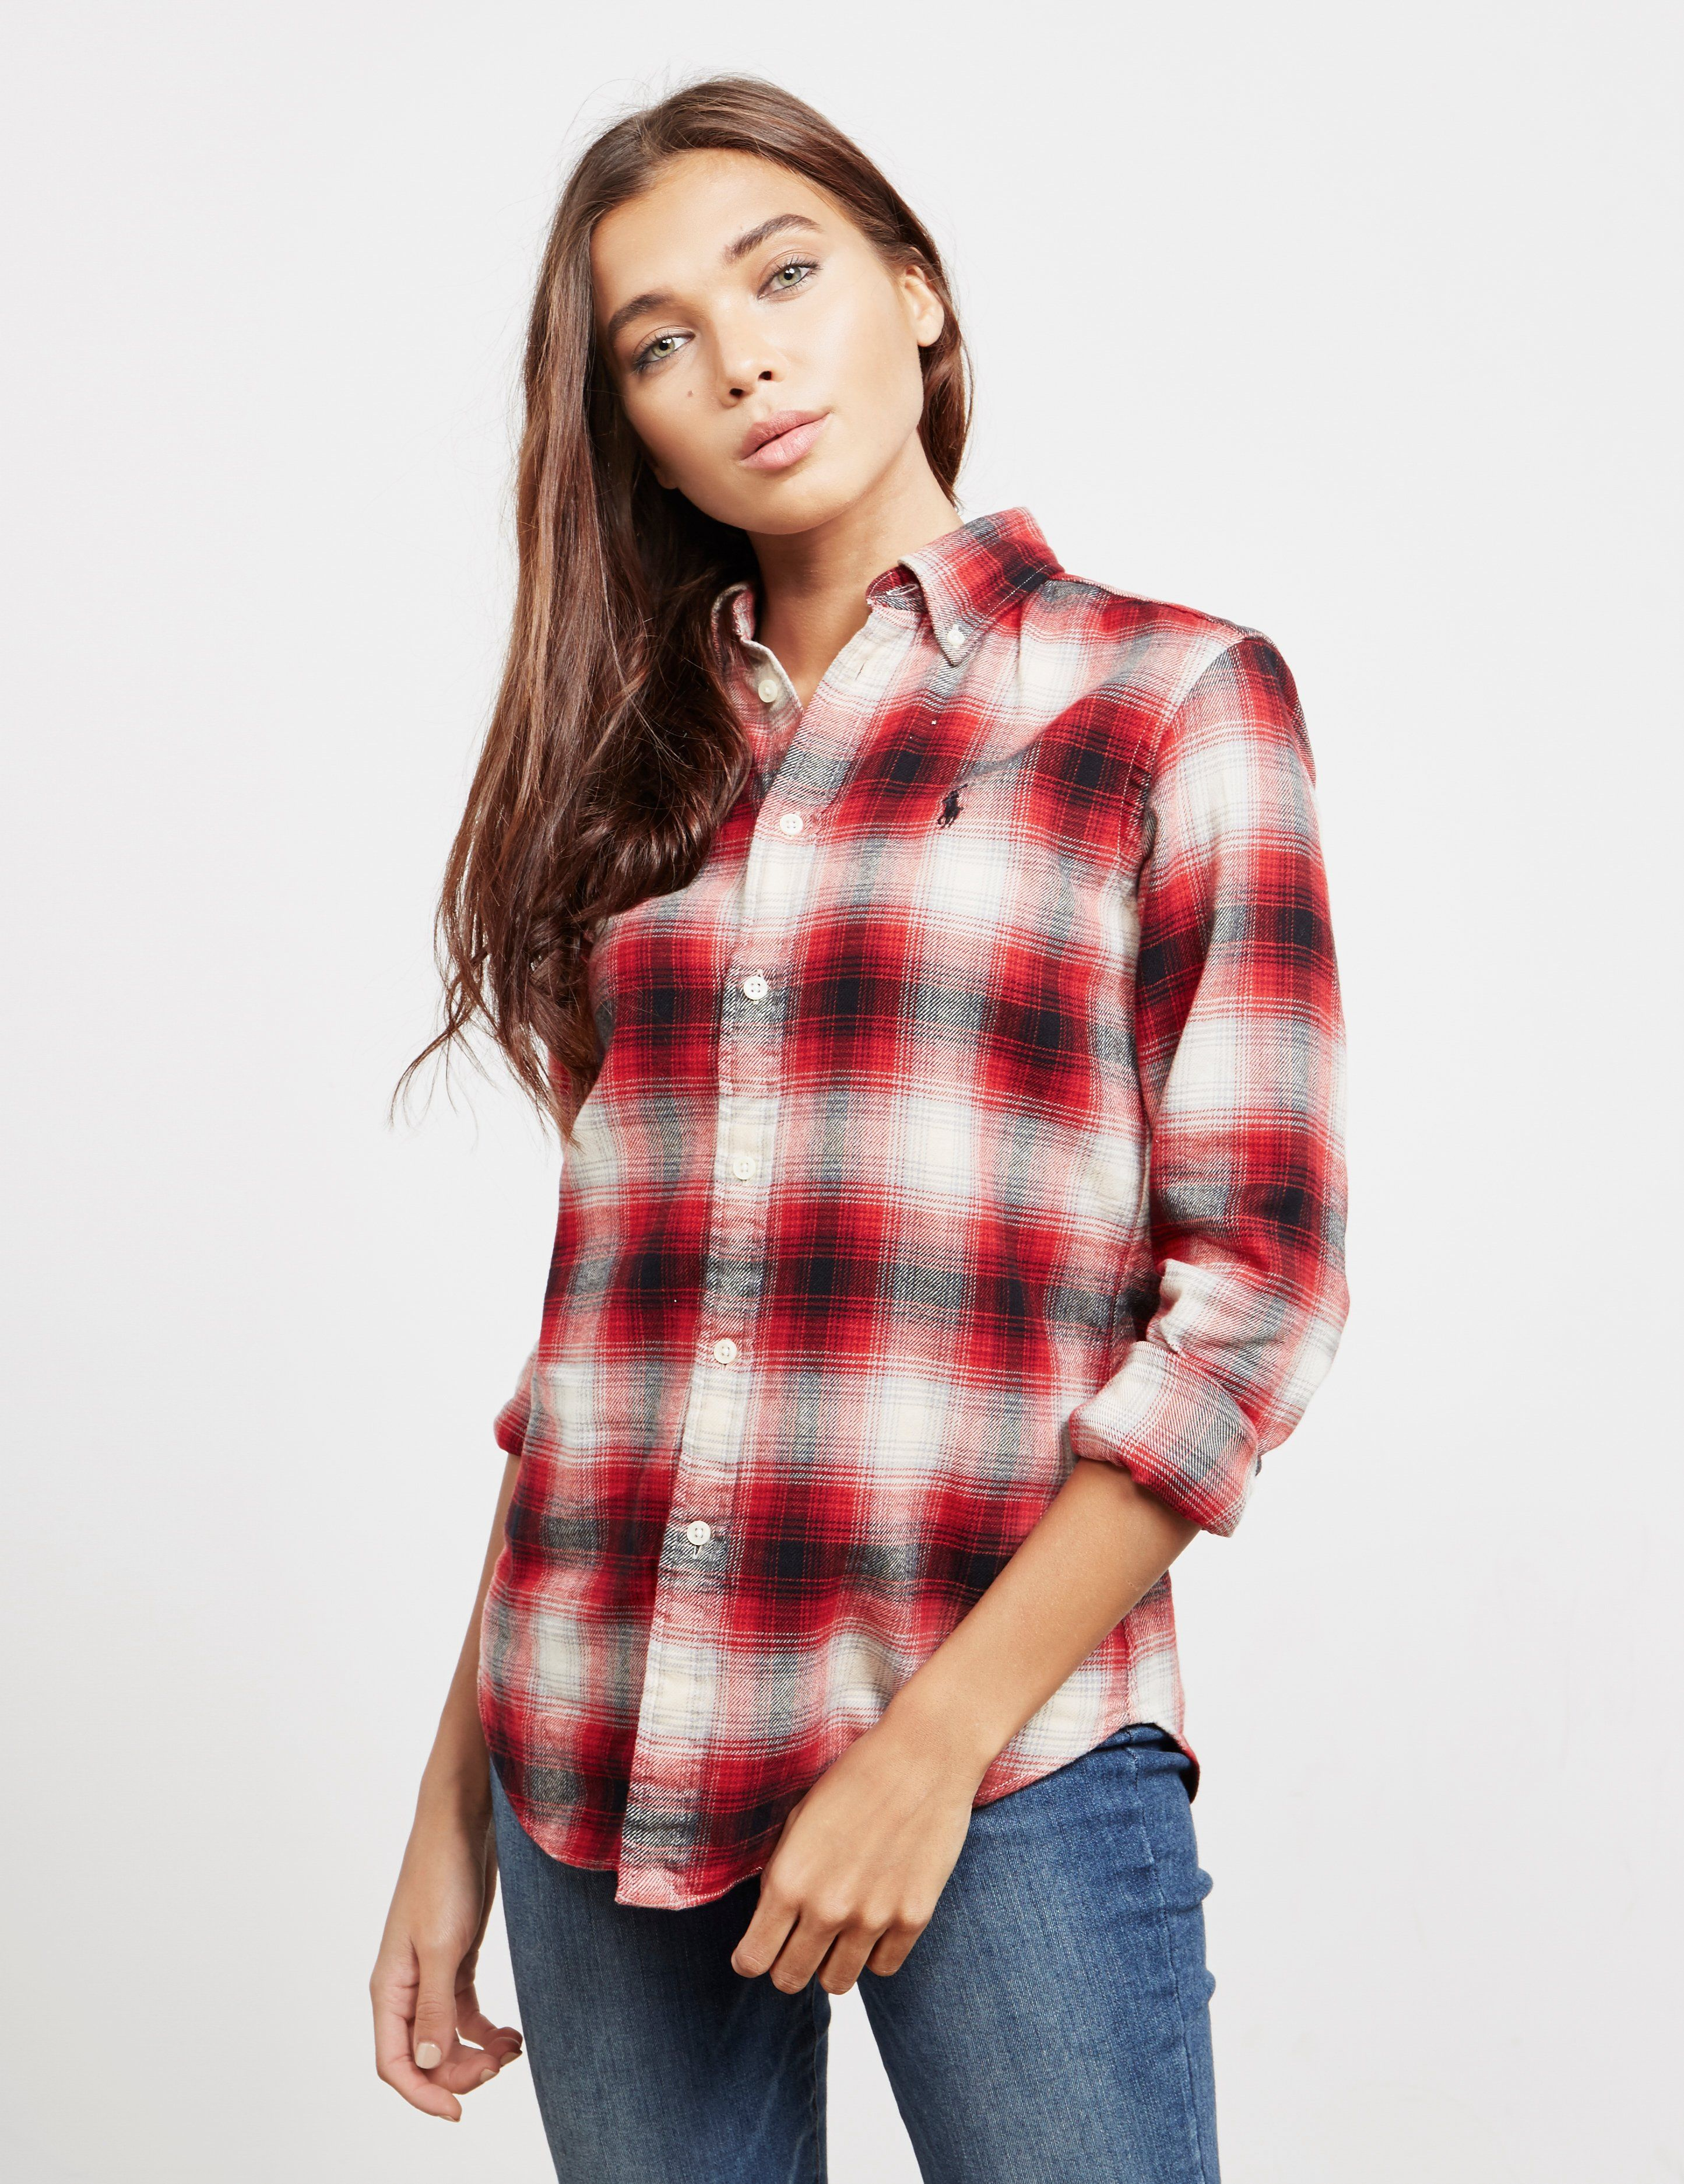 Polo Ralph Lauren Georgia Long Sleeve Shirt